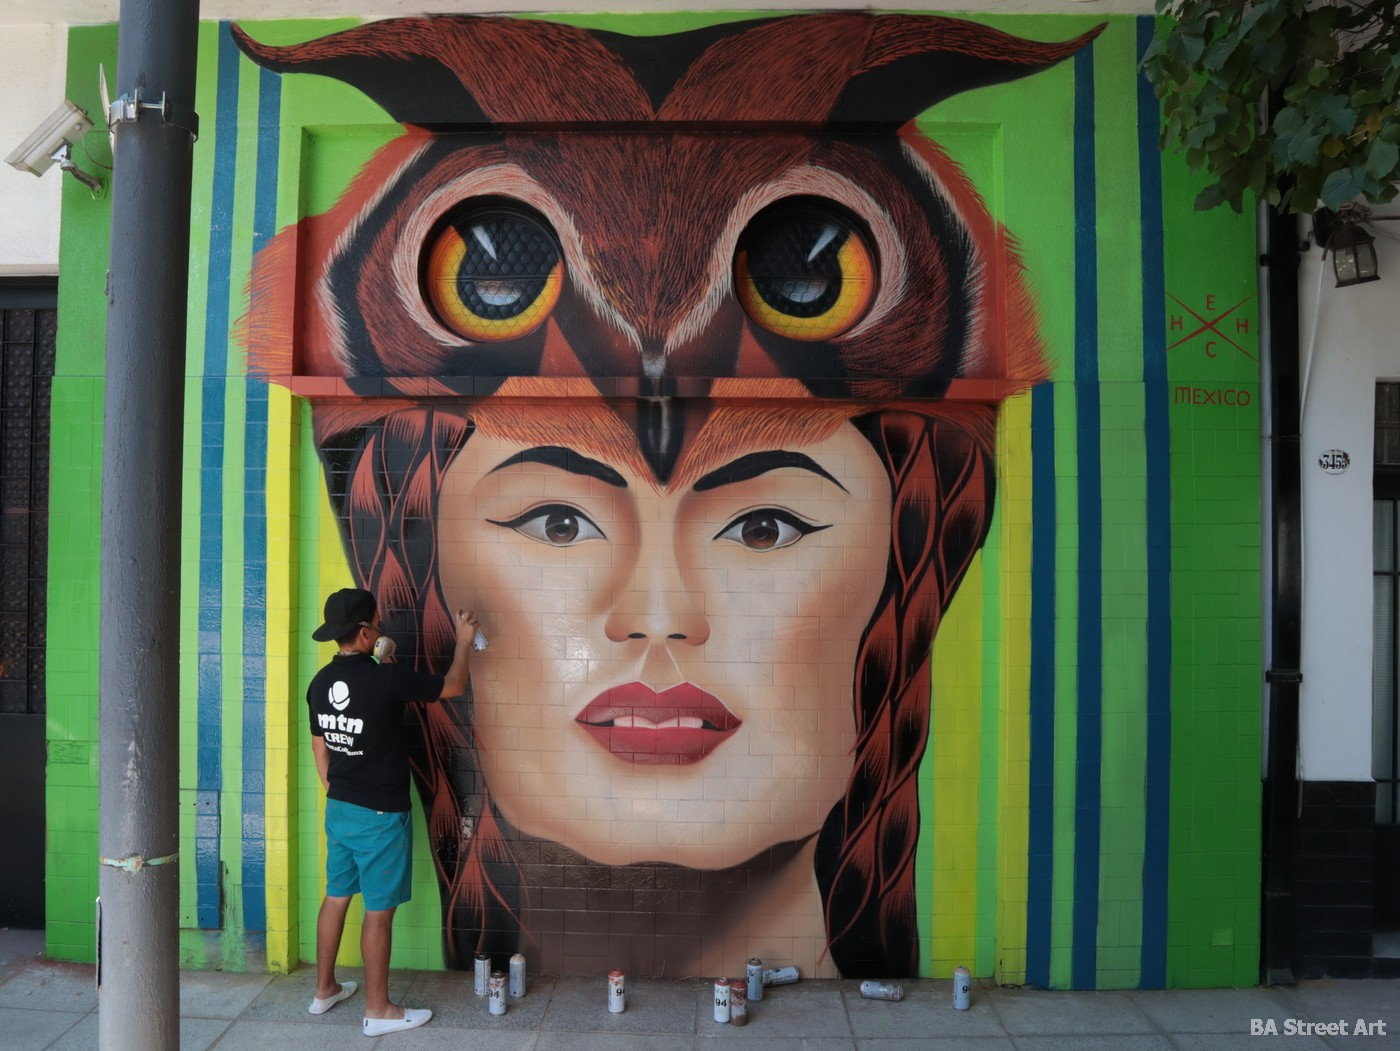 hech muralista artista mexicano retratos realismo arte urbano